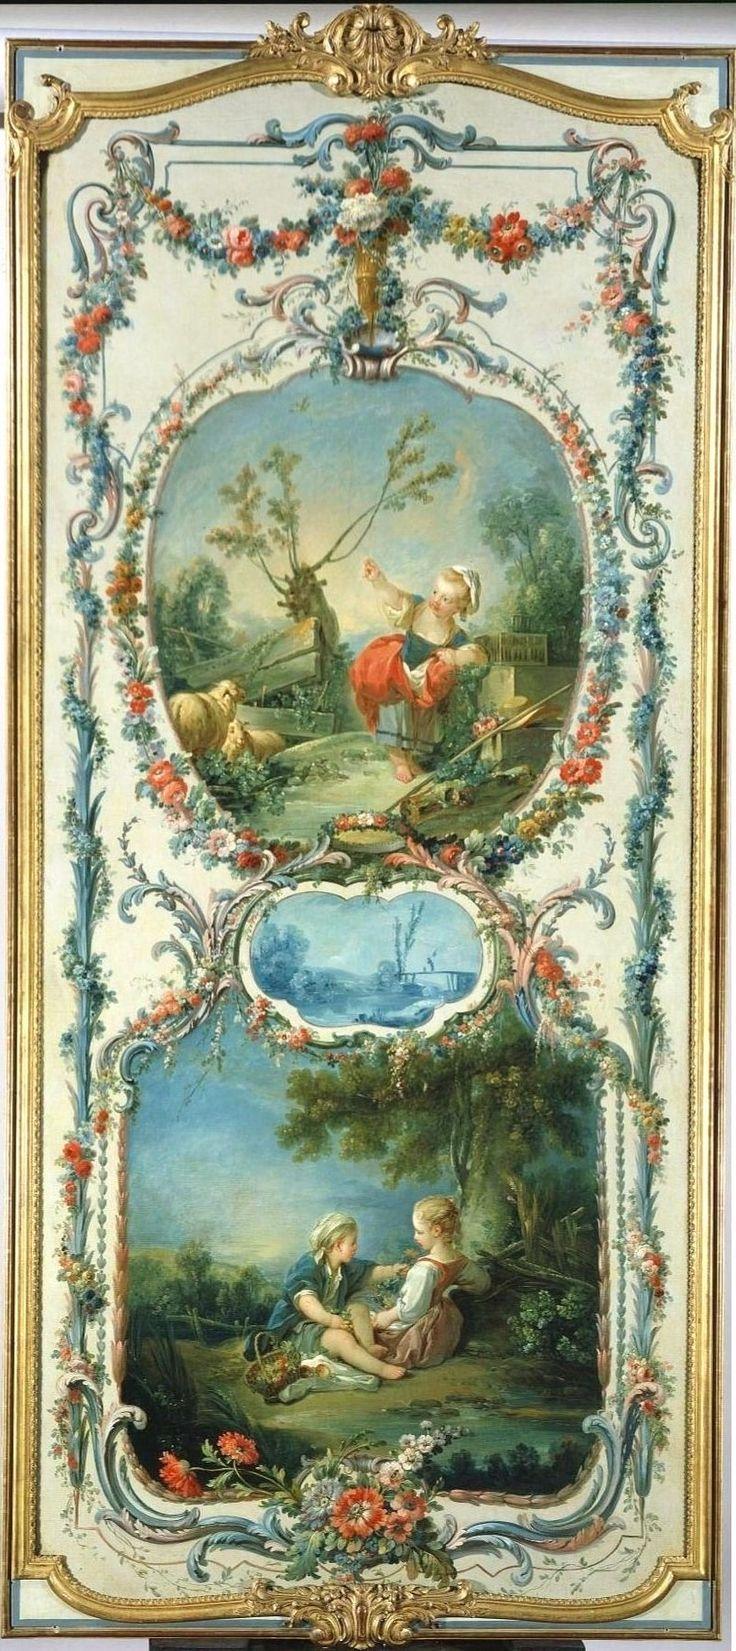 François Boucher (1703 - 1770) The Arts and Sciences: Fowling and Horticulture, 1750-1752 oil on canvas Madame de Pompadour, Château de Crécy The Frick Collection